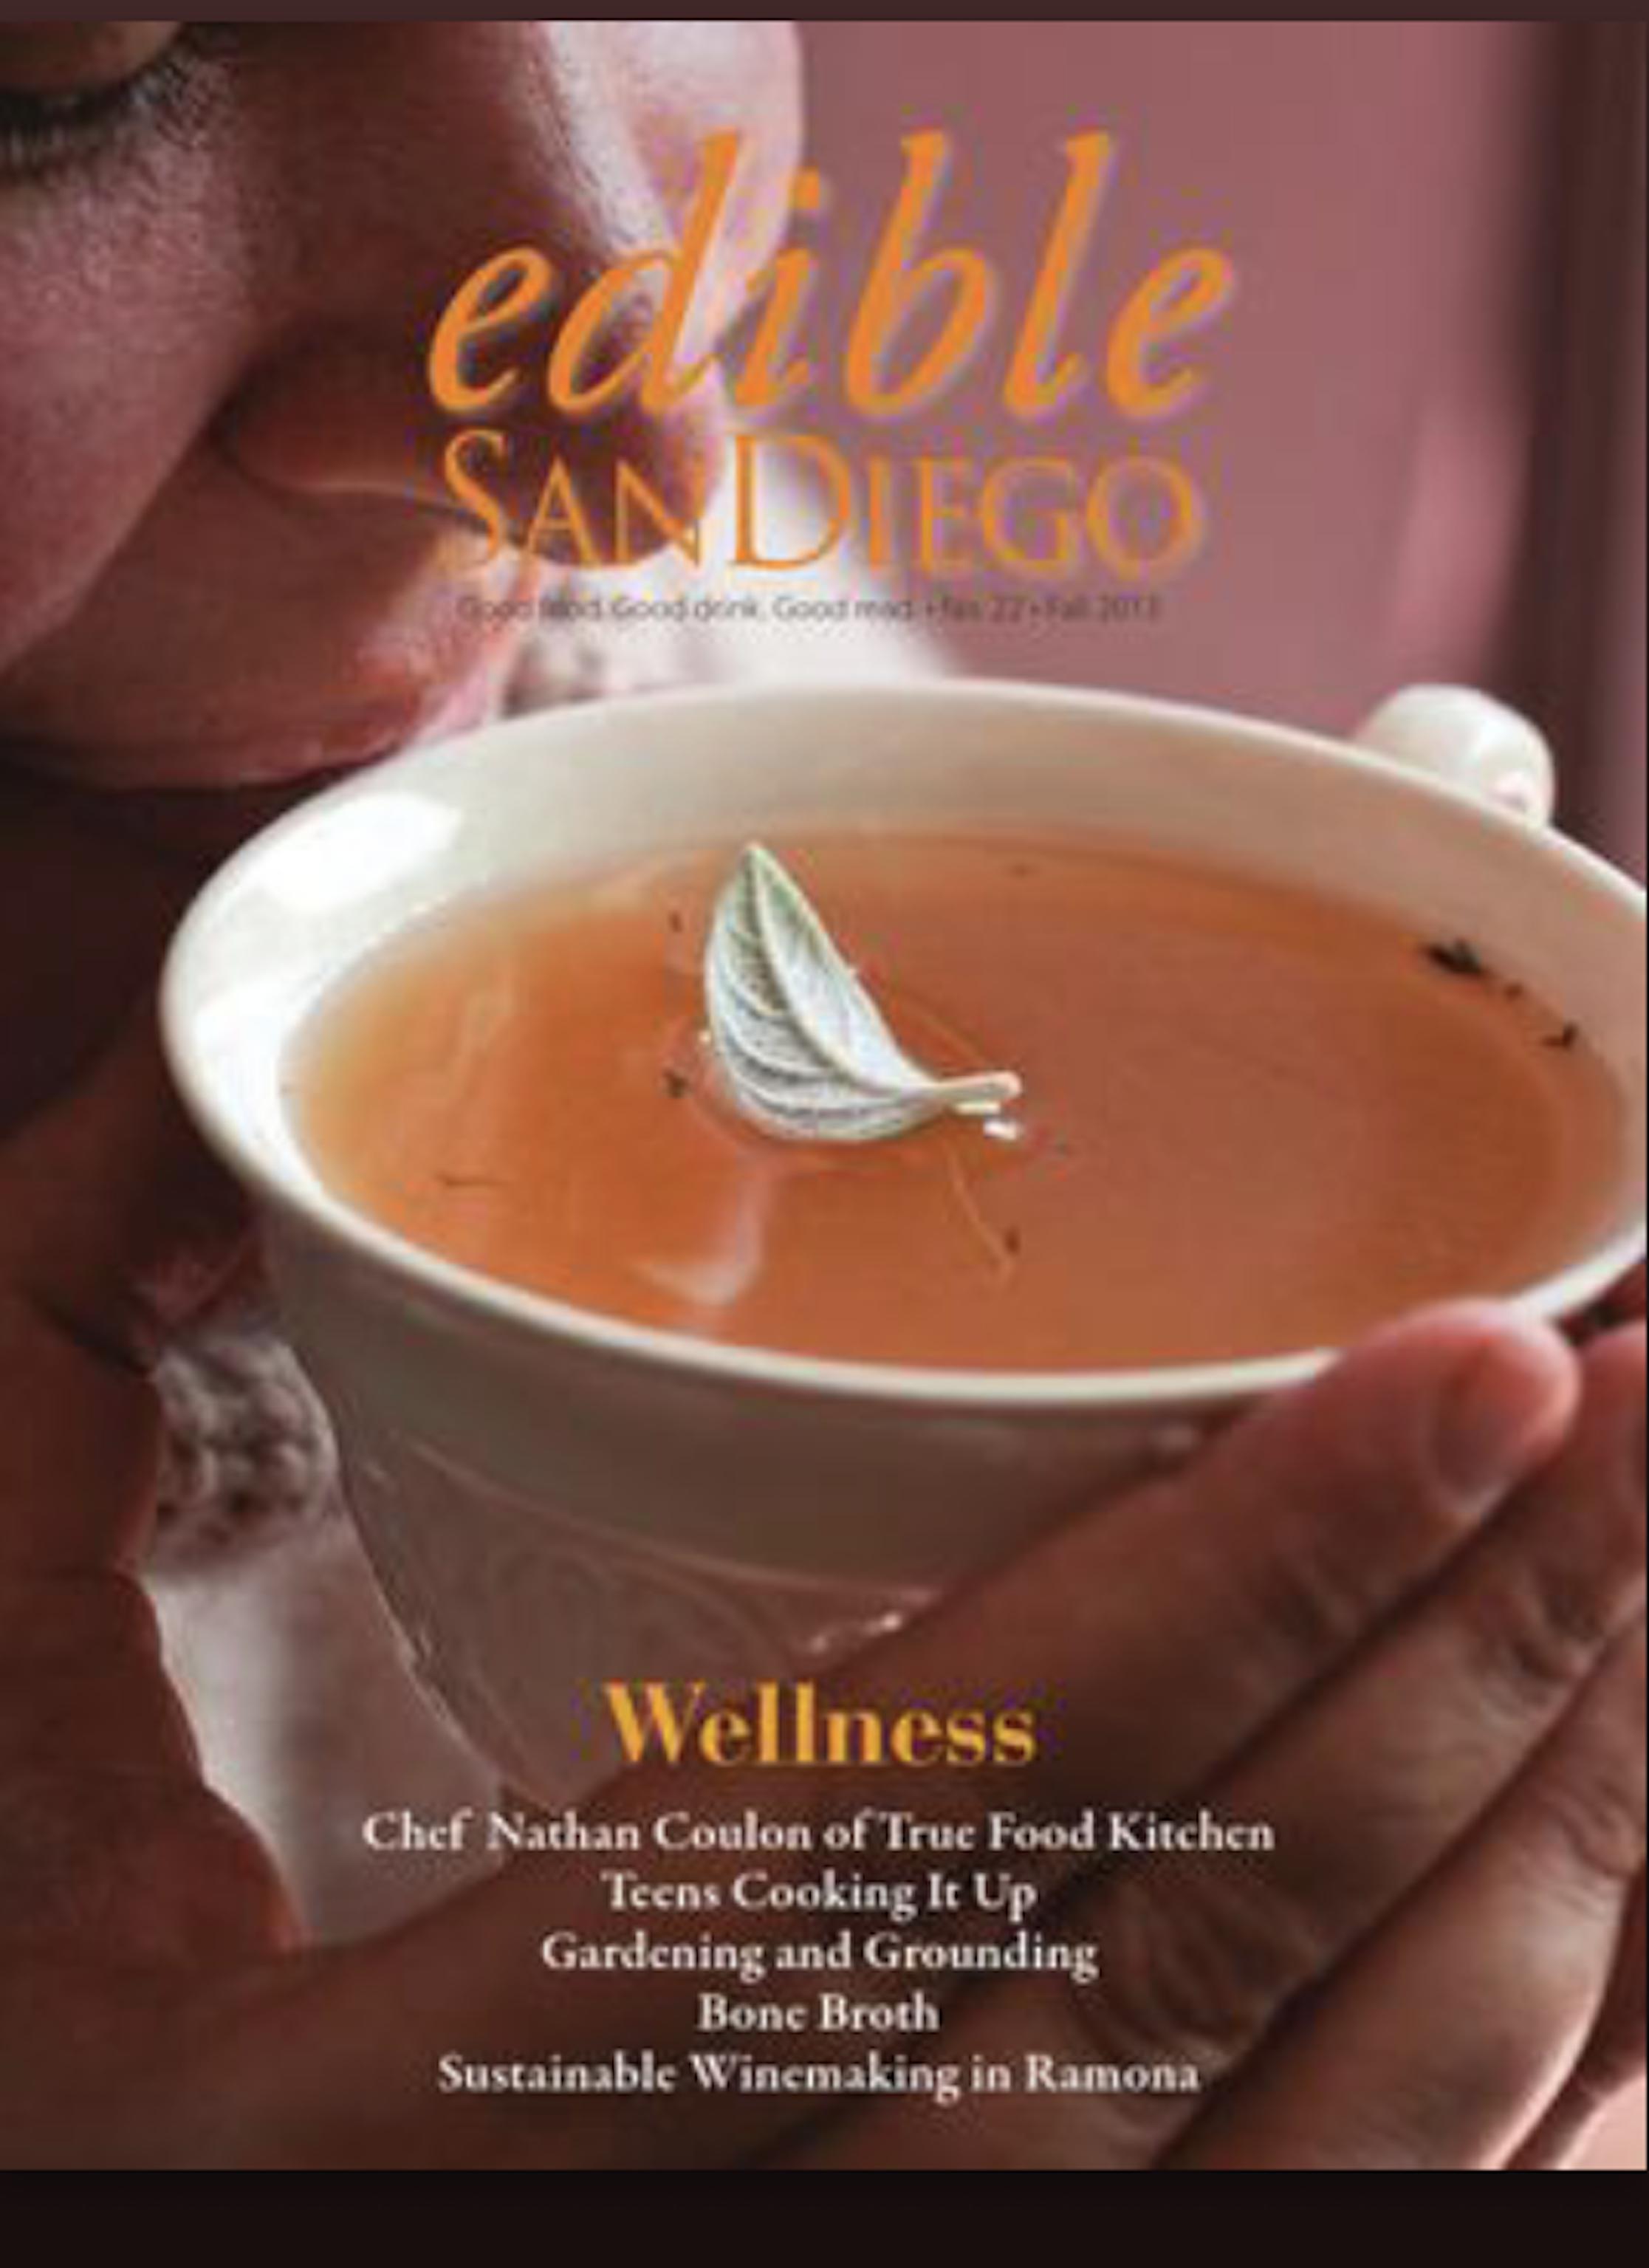 Edible San Diego Wellness Issue